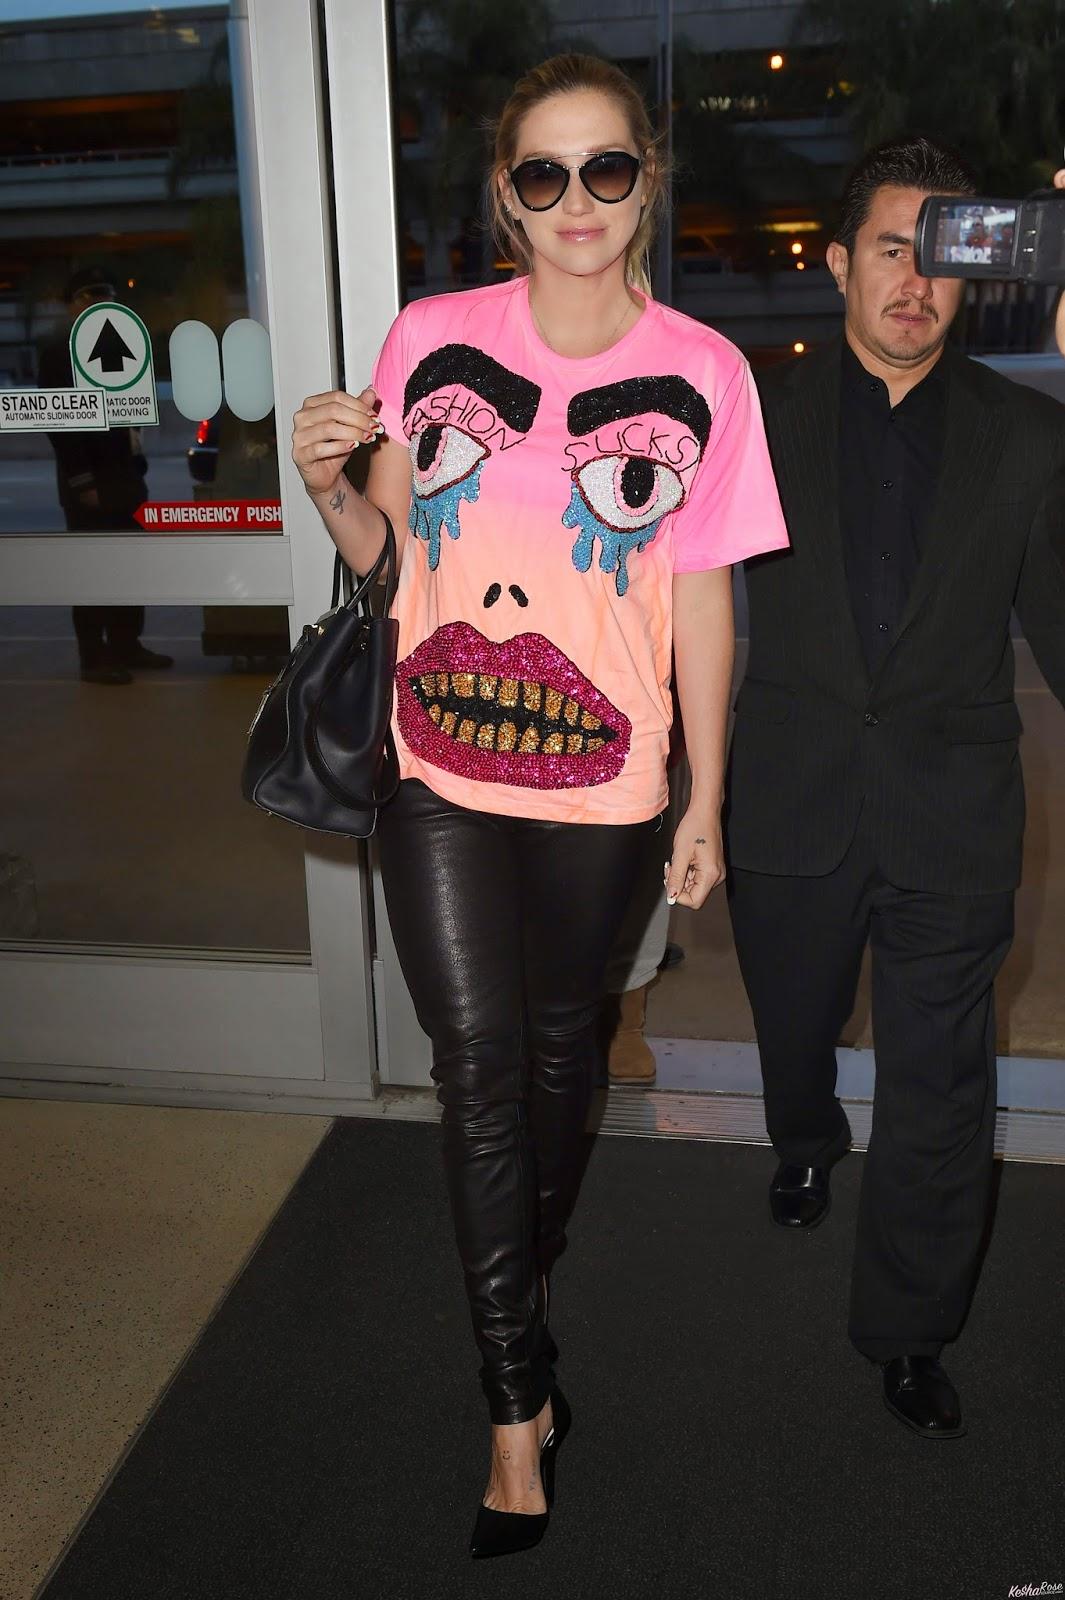 Kesha >> Galería [Candids, apariciones, paparazzi, etc.] - Página 14 %2BKesha%2BSays%2B%22Fashion%2BSucks%22-1